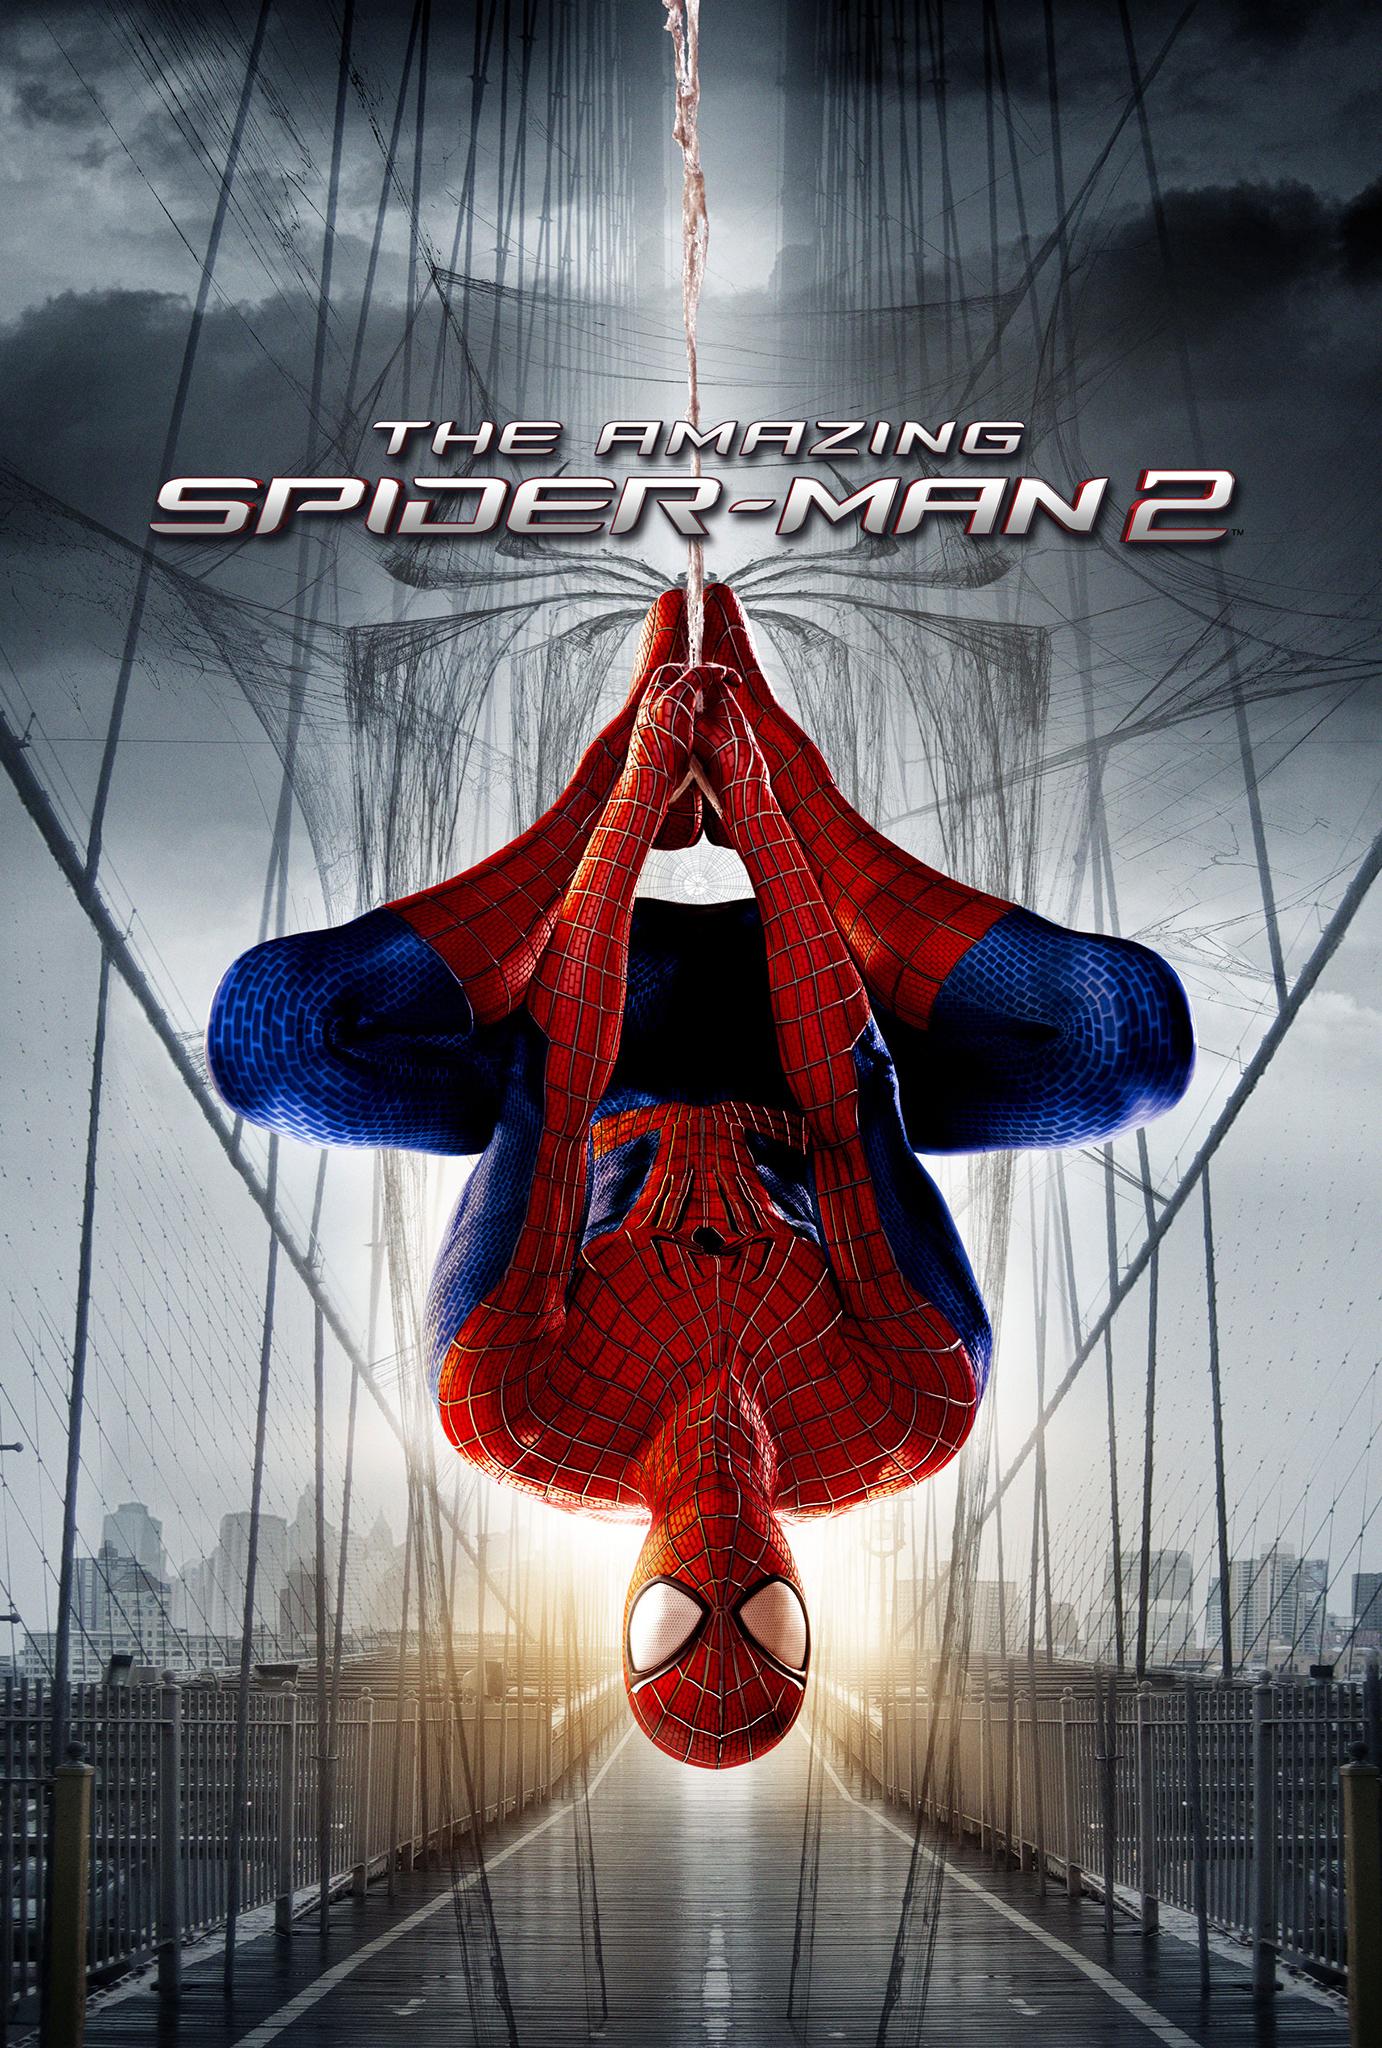 Spider-Man (E3 2016 Trailer) for PS4 | BallerStatus.com